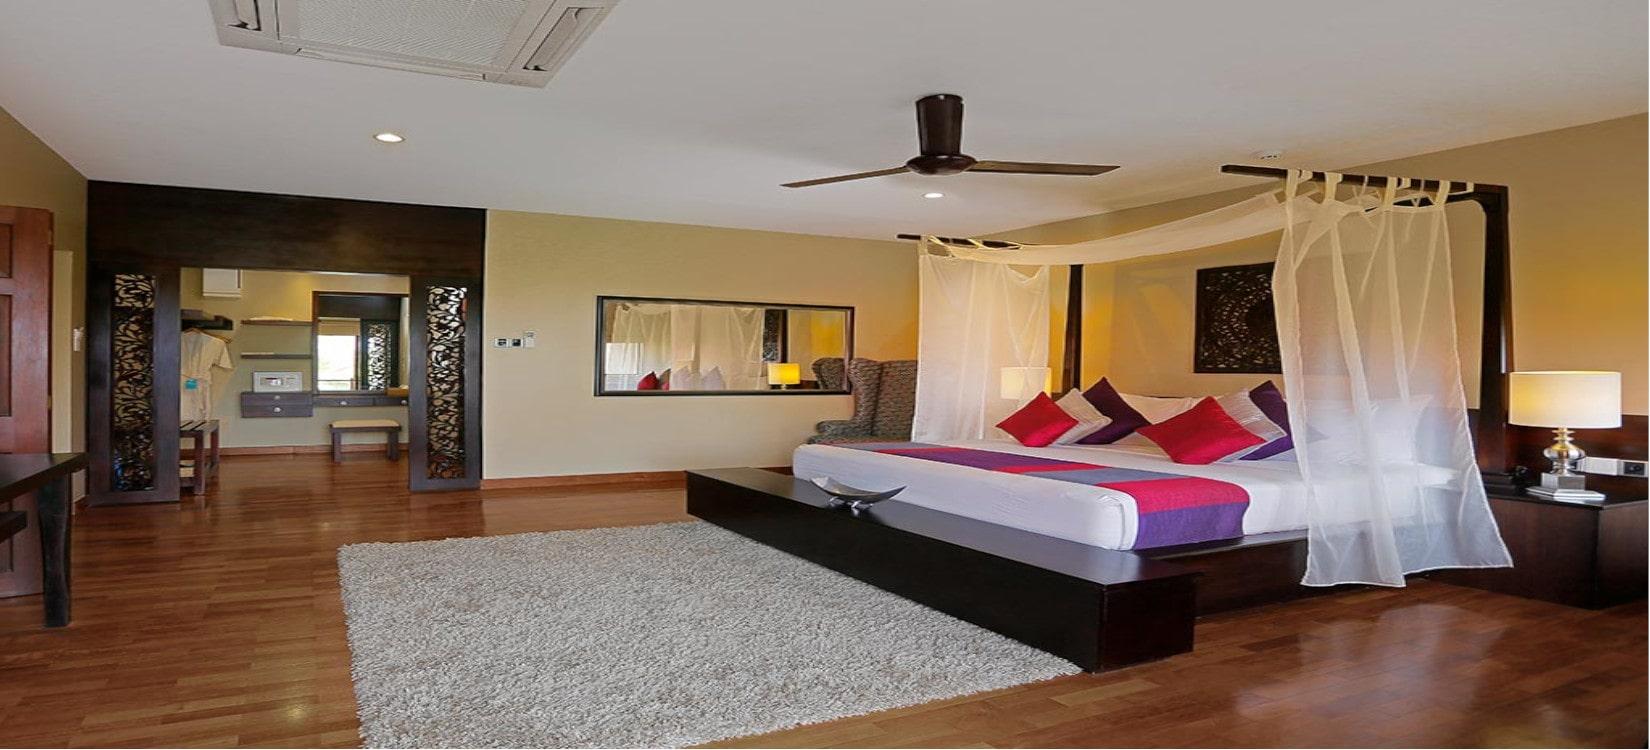 uga bay bay suite-min